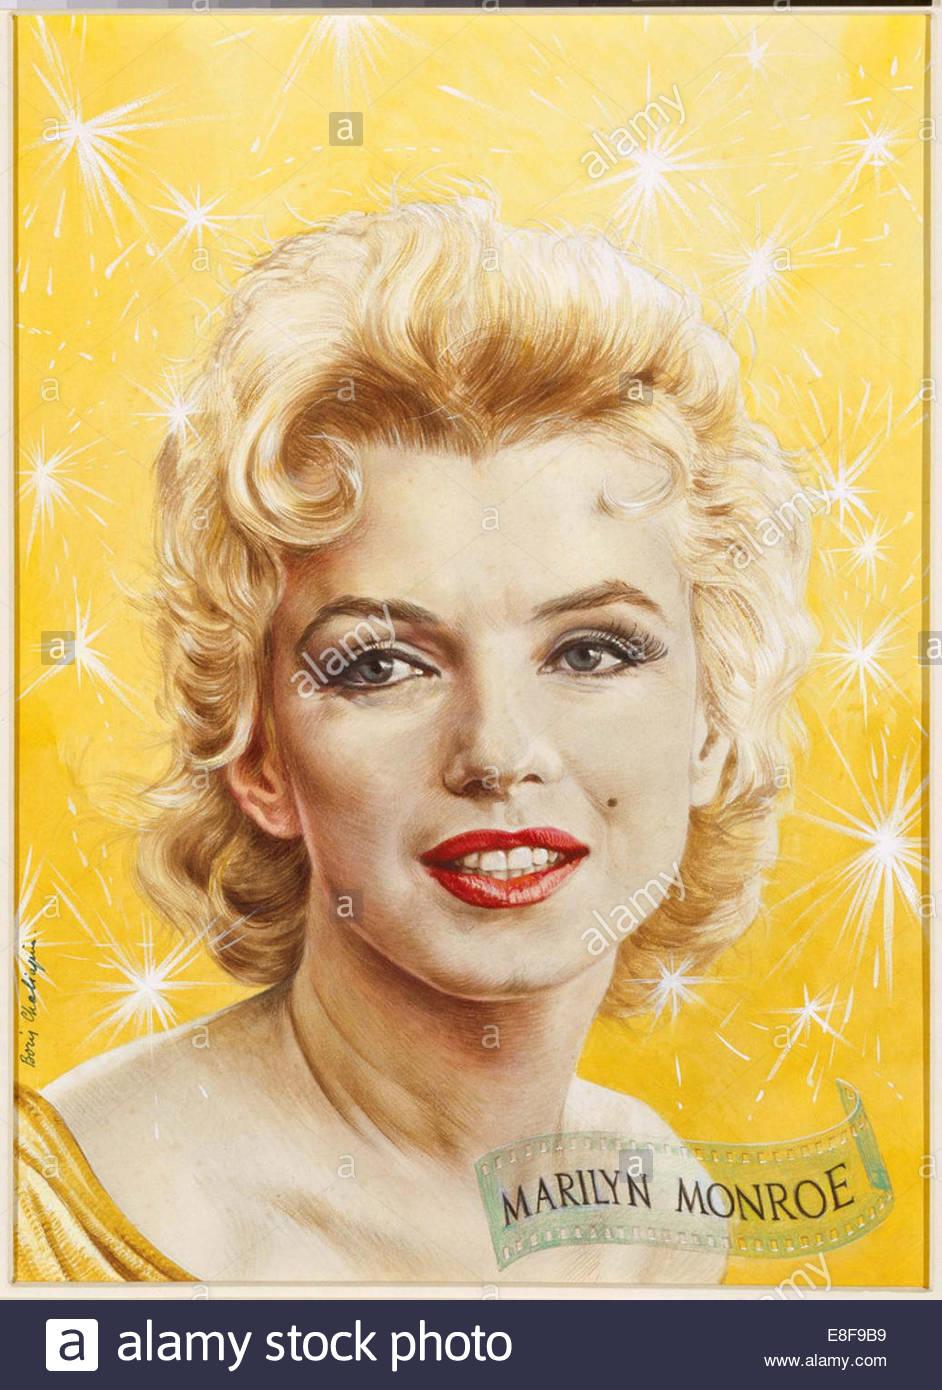 Marilyn Monroe. TIME Magazine Cover. Artist: Chaliapin (Shalyapin), Boris Fyodorovich (1904-1979) - Stock Image